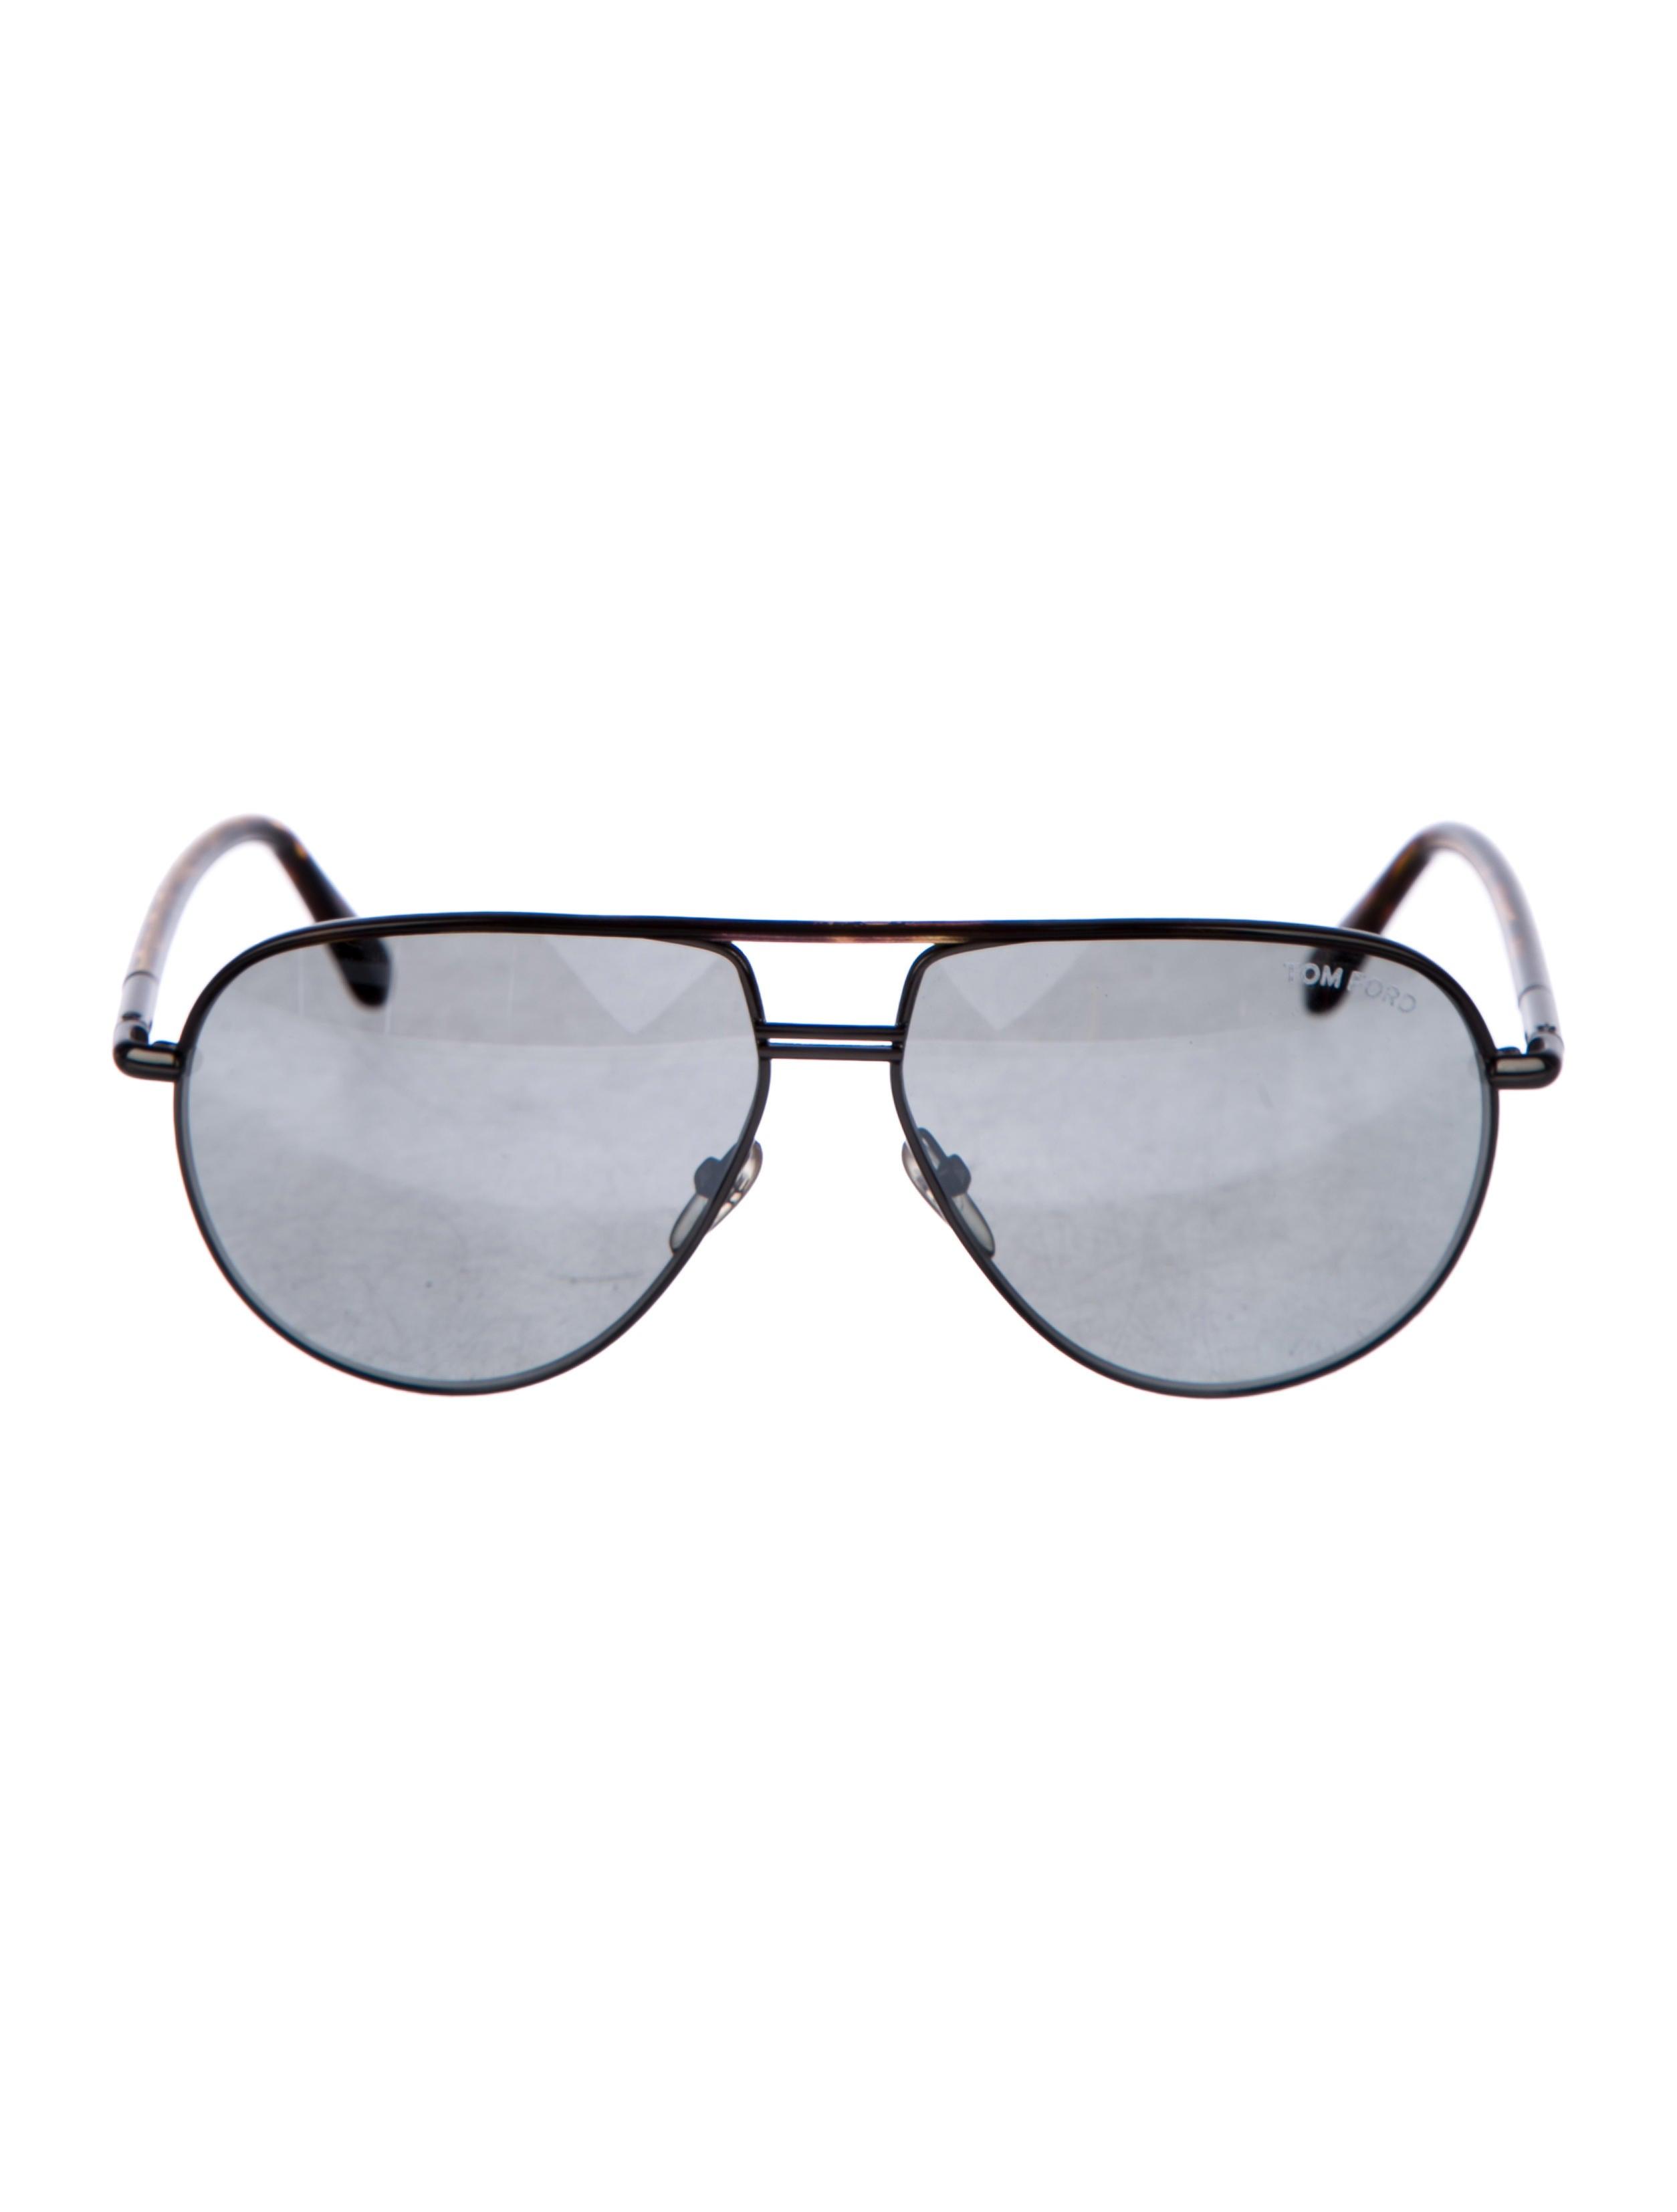 a46d46c84a7 Tom Ford Cole Aviator Sunglasses - Accessories - TOM50511